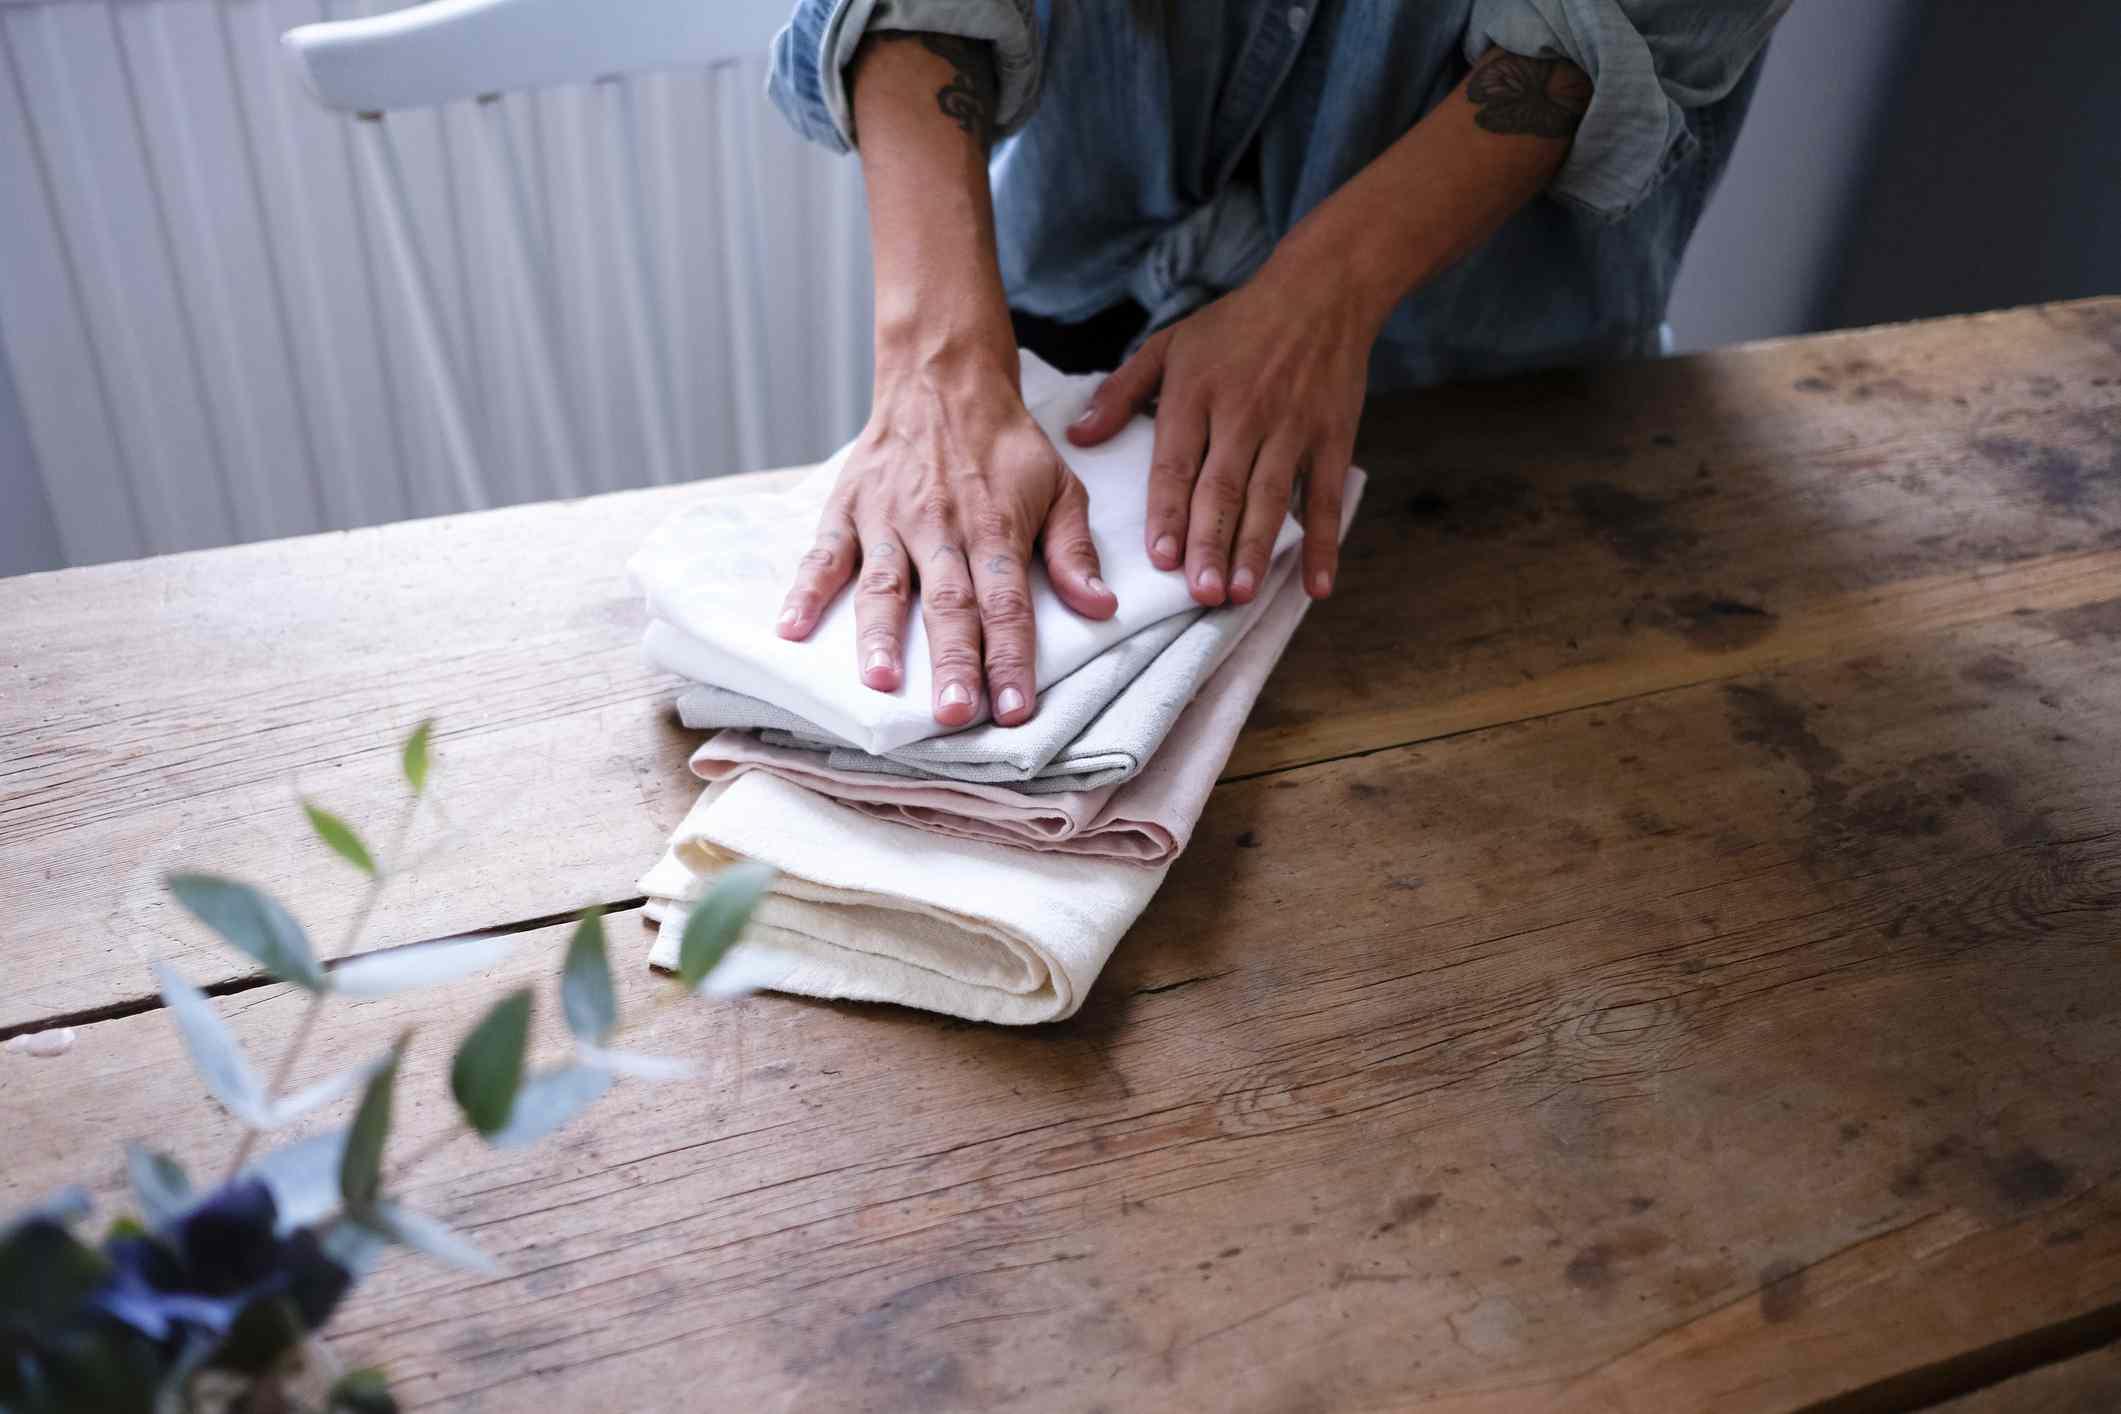 woman folding napkins